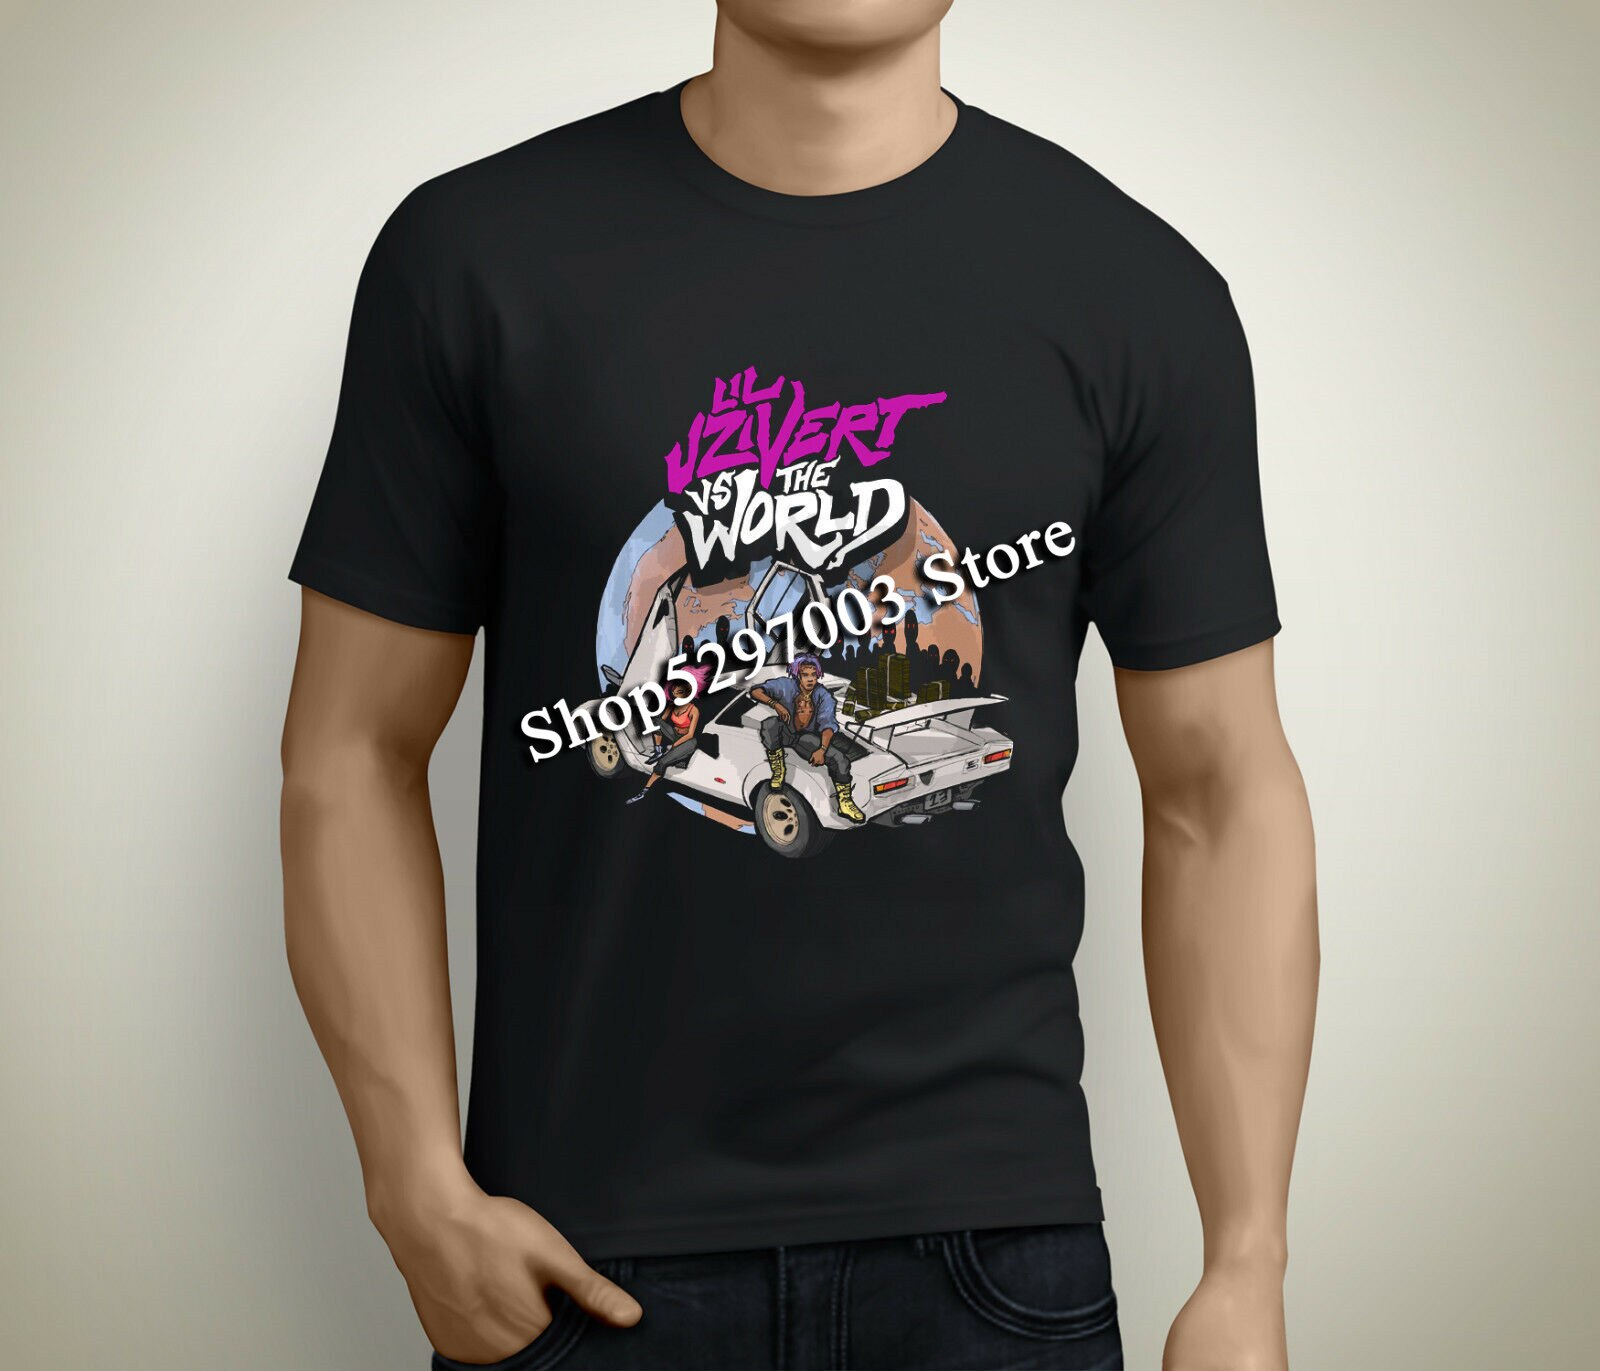 Nueva camiseta negra para hombre de manga corta Lil Uzi Vert Vs. World talla S a 3Xl camiseta de gimnasio